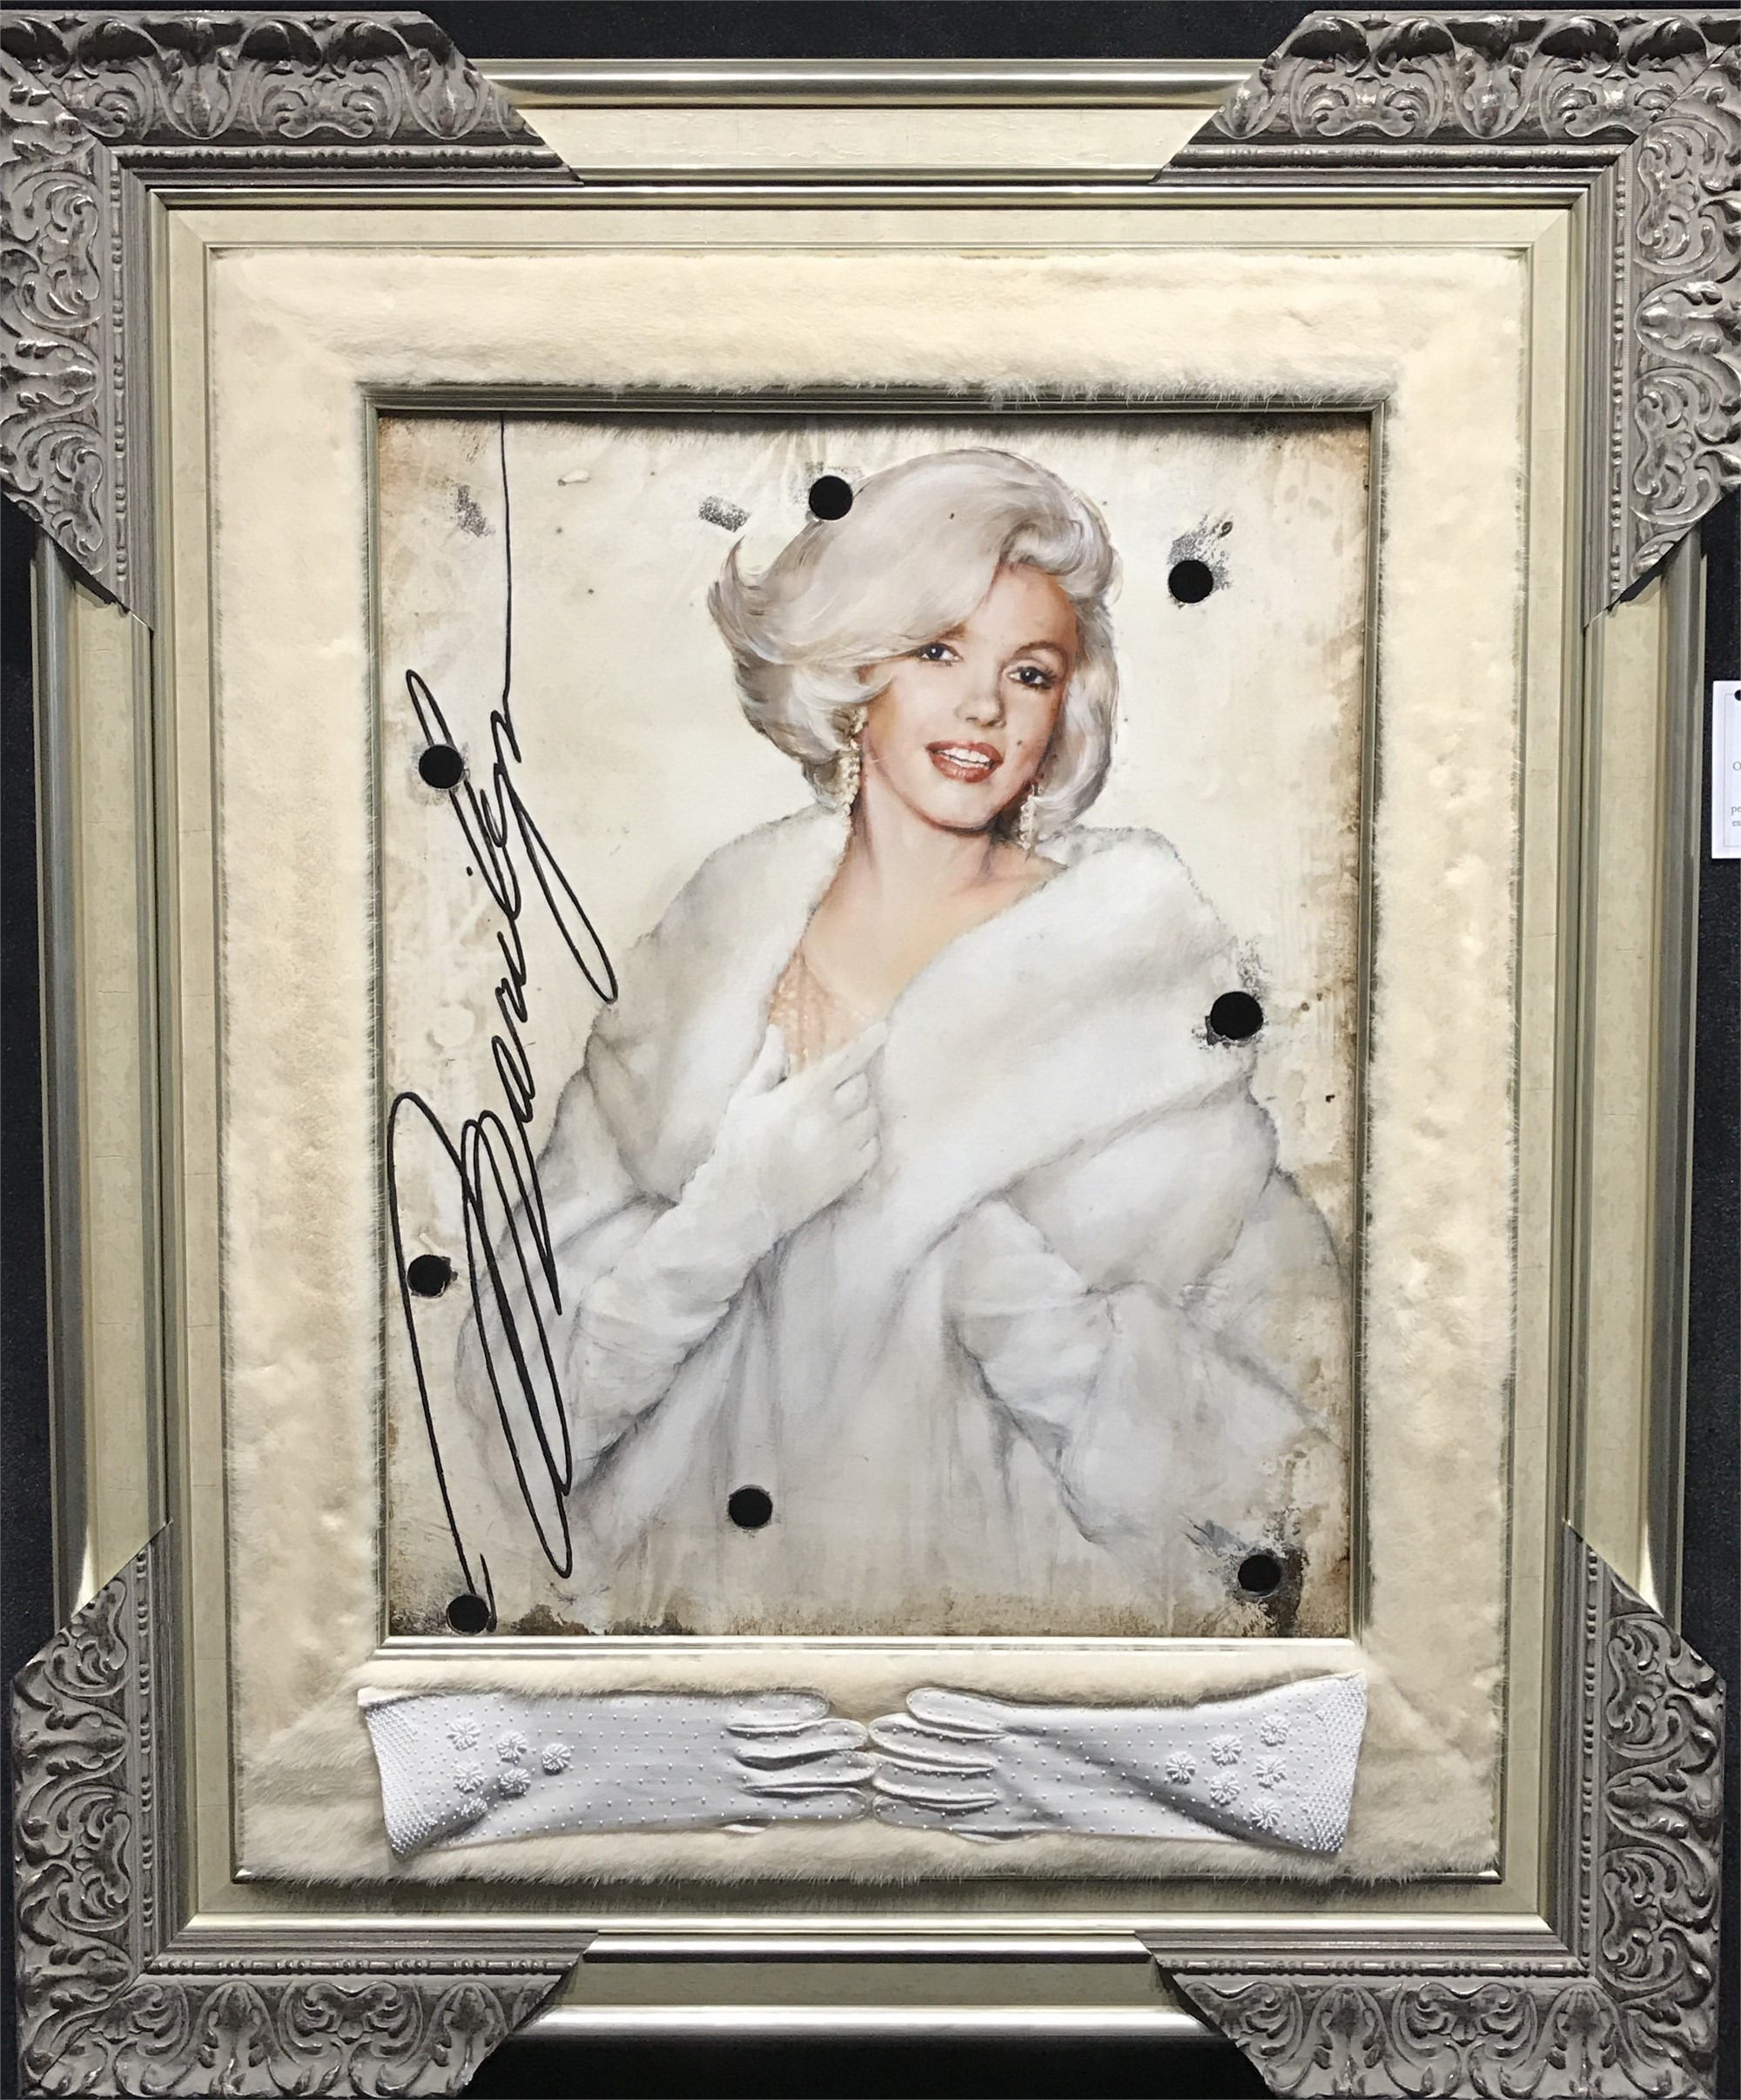 Marilyn Monroe Happy Birthday Mr. President by Bill Mack